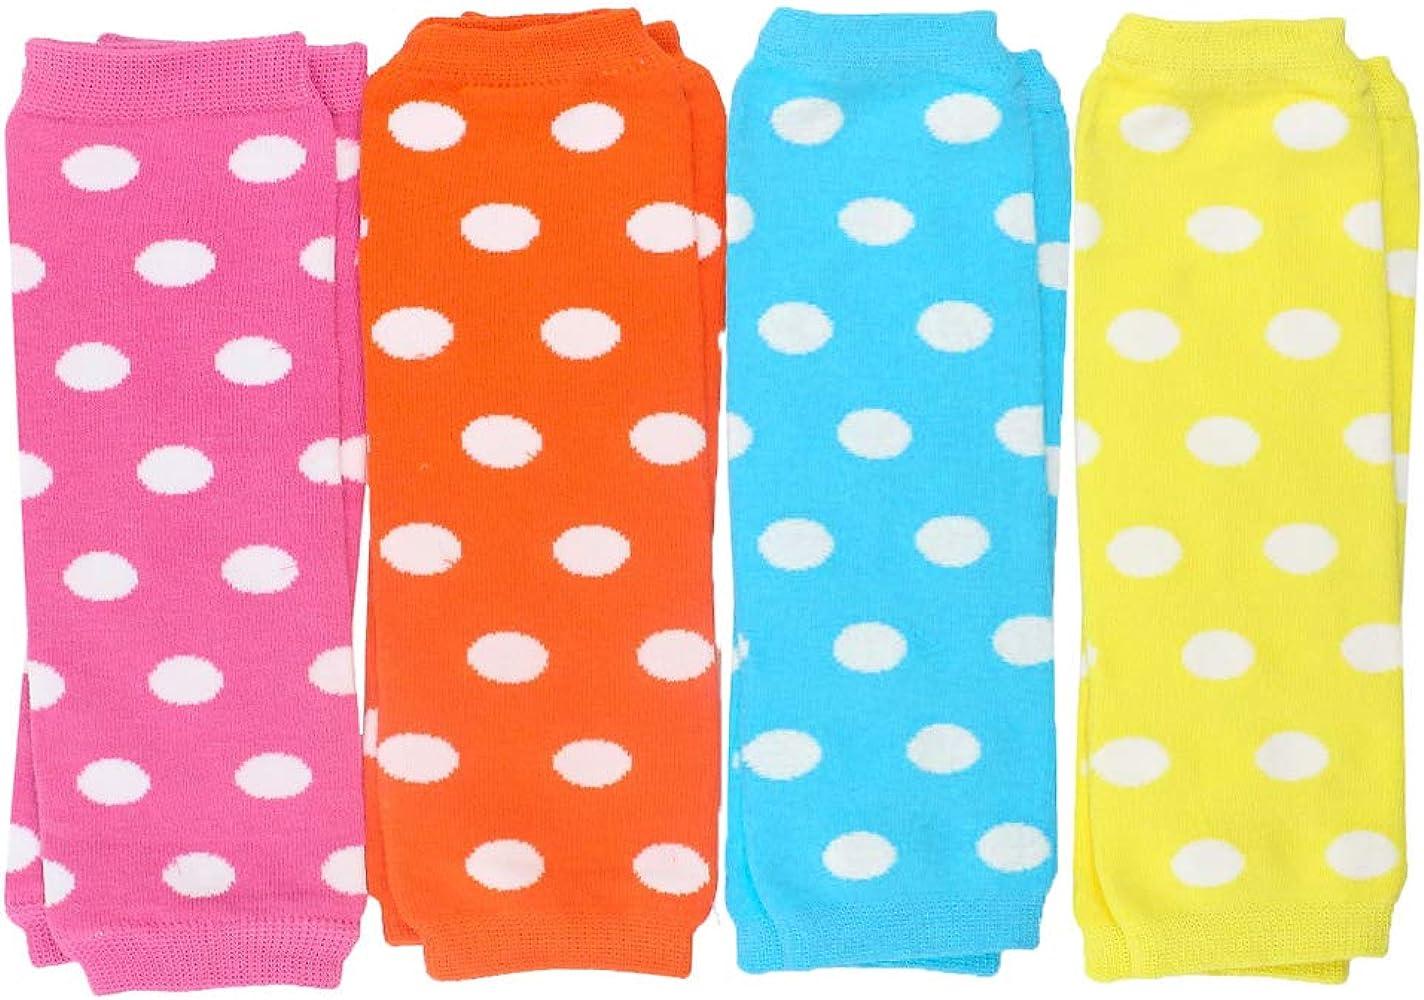 Powder Pink Polka Dot Lavender Polka Dot juDanzy 3 Pair Baby Girl Leg Warmers Aqua Polka Dot